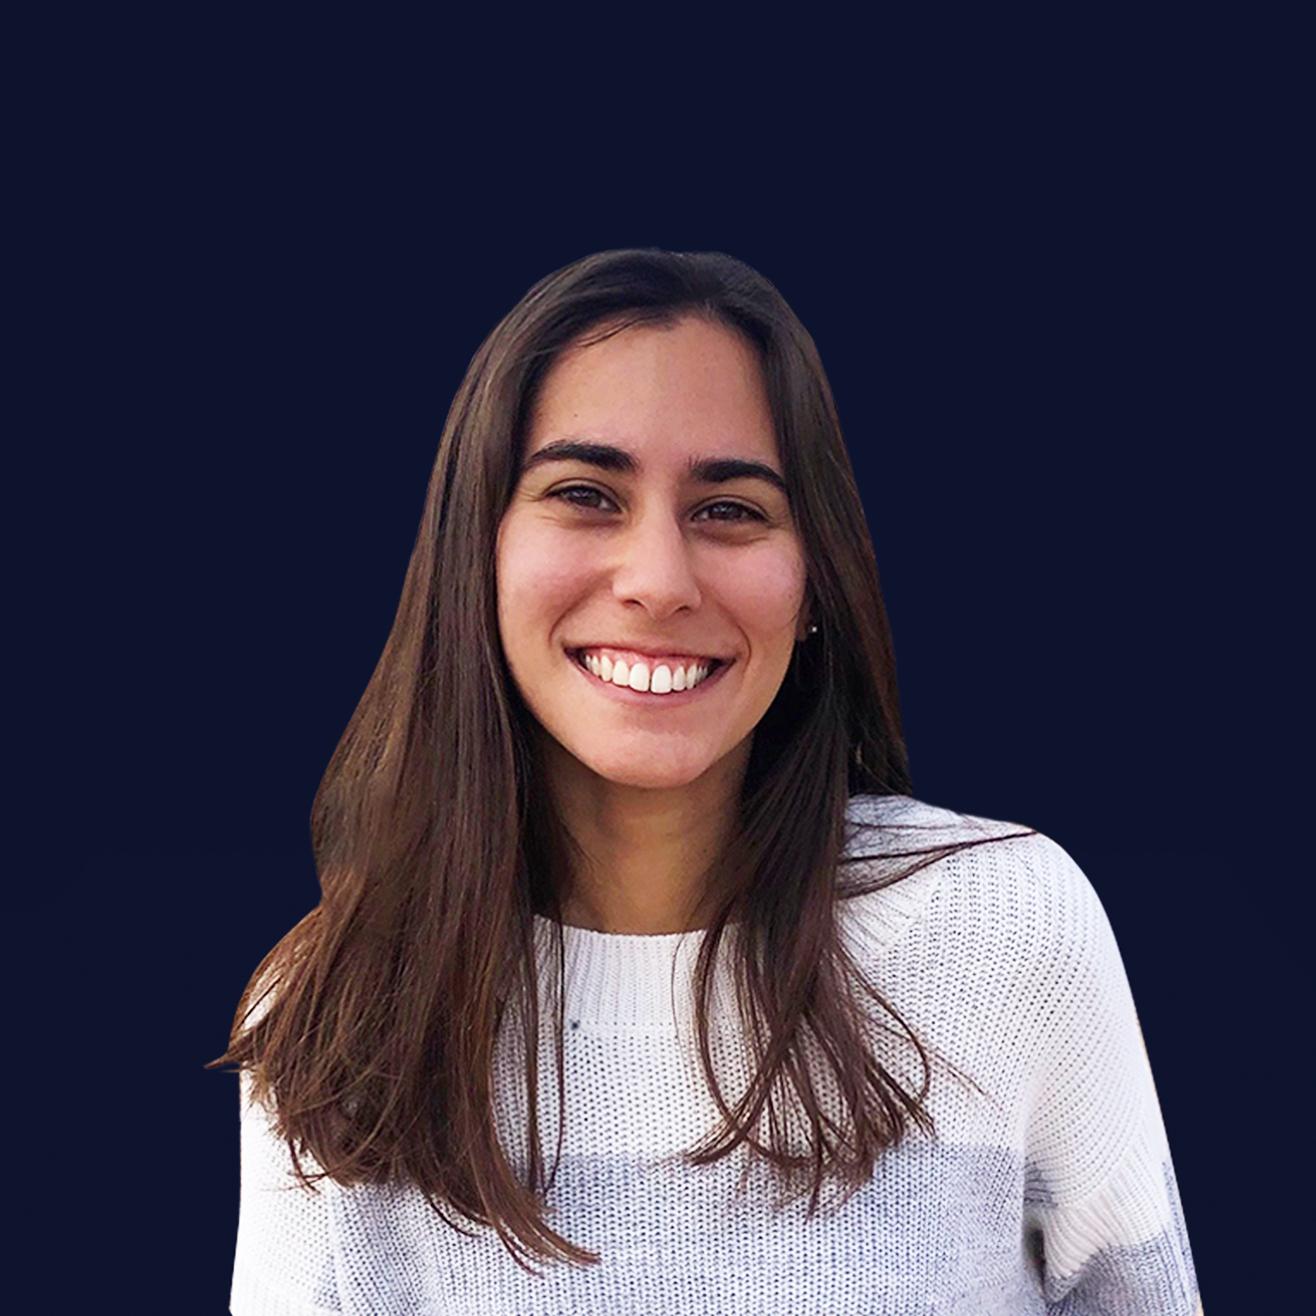 Lara Bellatin